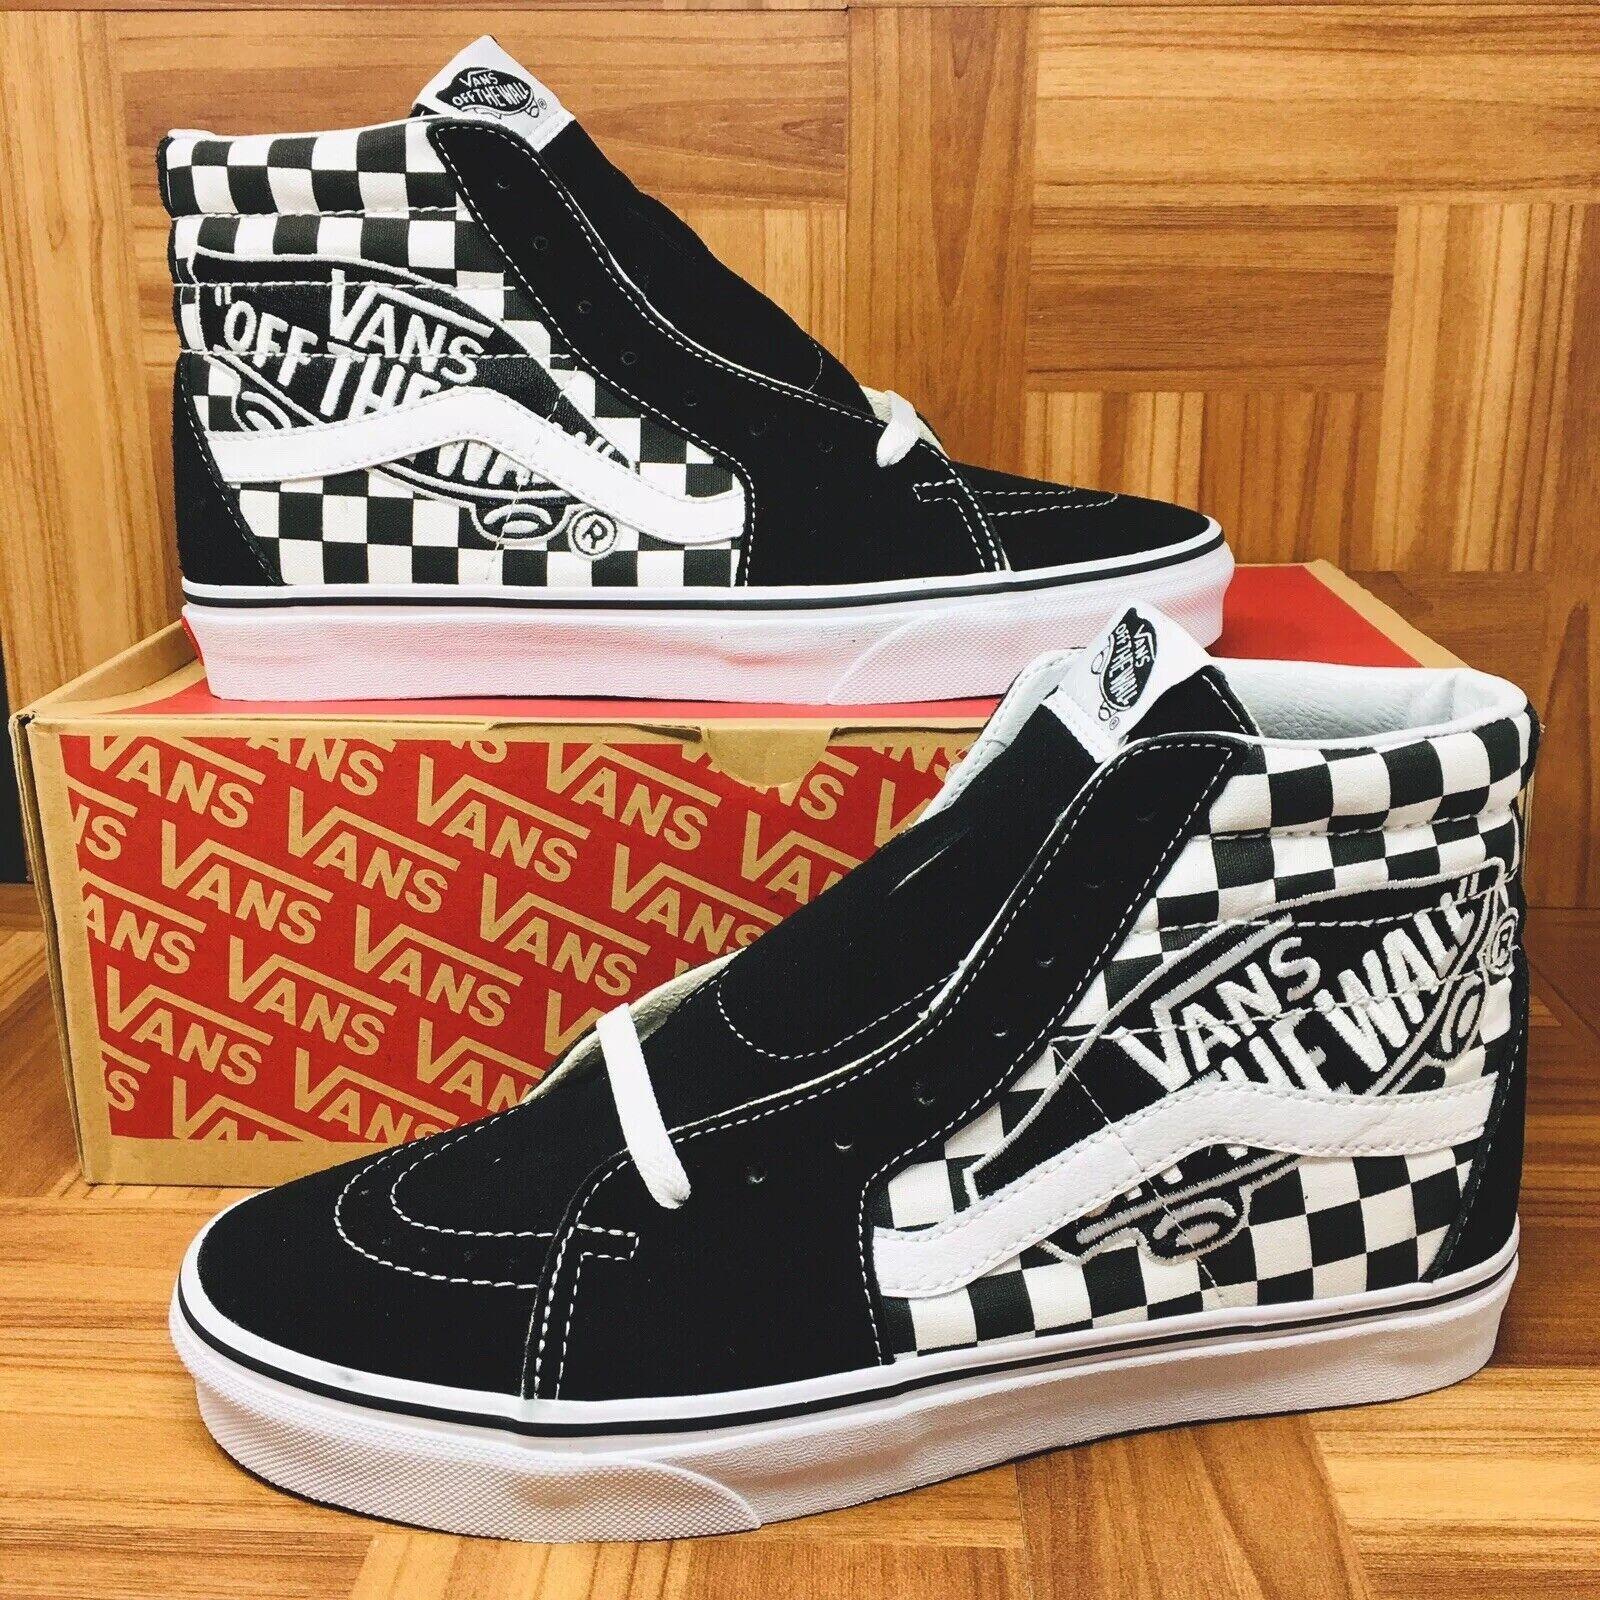 NEW Vans Authentic Old Skool Hi-Sk8 (Men Size 13) Checkered Van Patch shoes